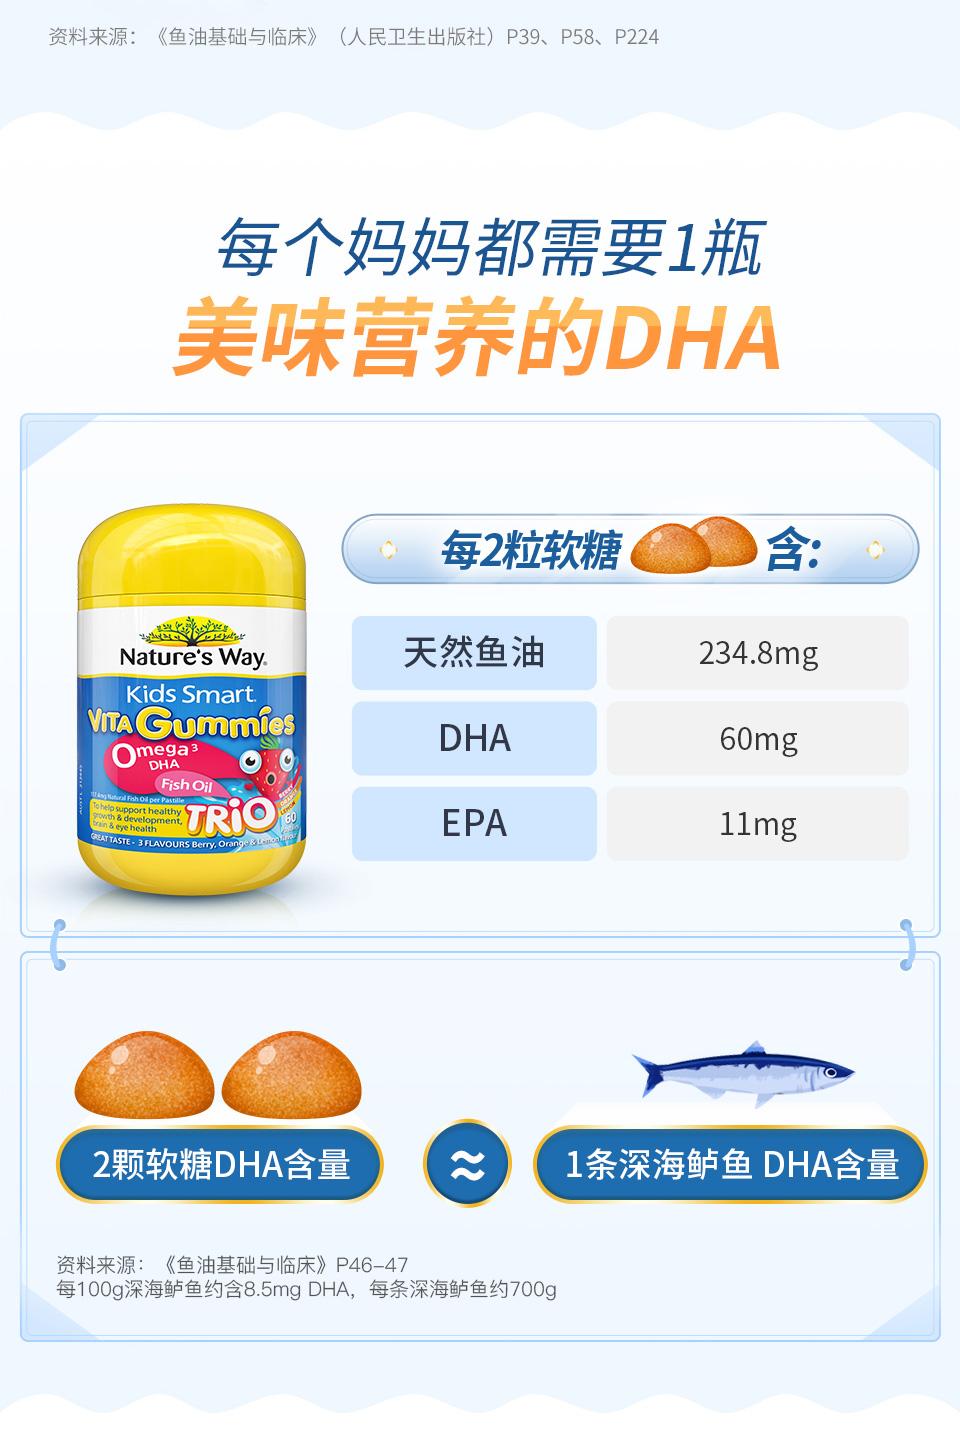 Nature'sWay澳洲佳思敏儿童鱼油软糖欧米茄3深海鱼油宝宝DHA两瓶 产品系列 第5张